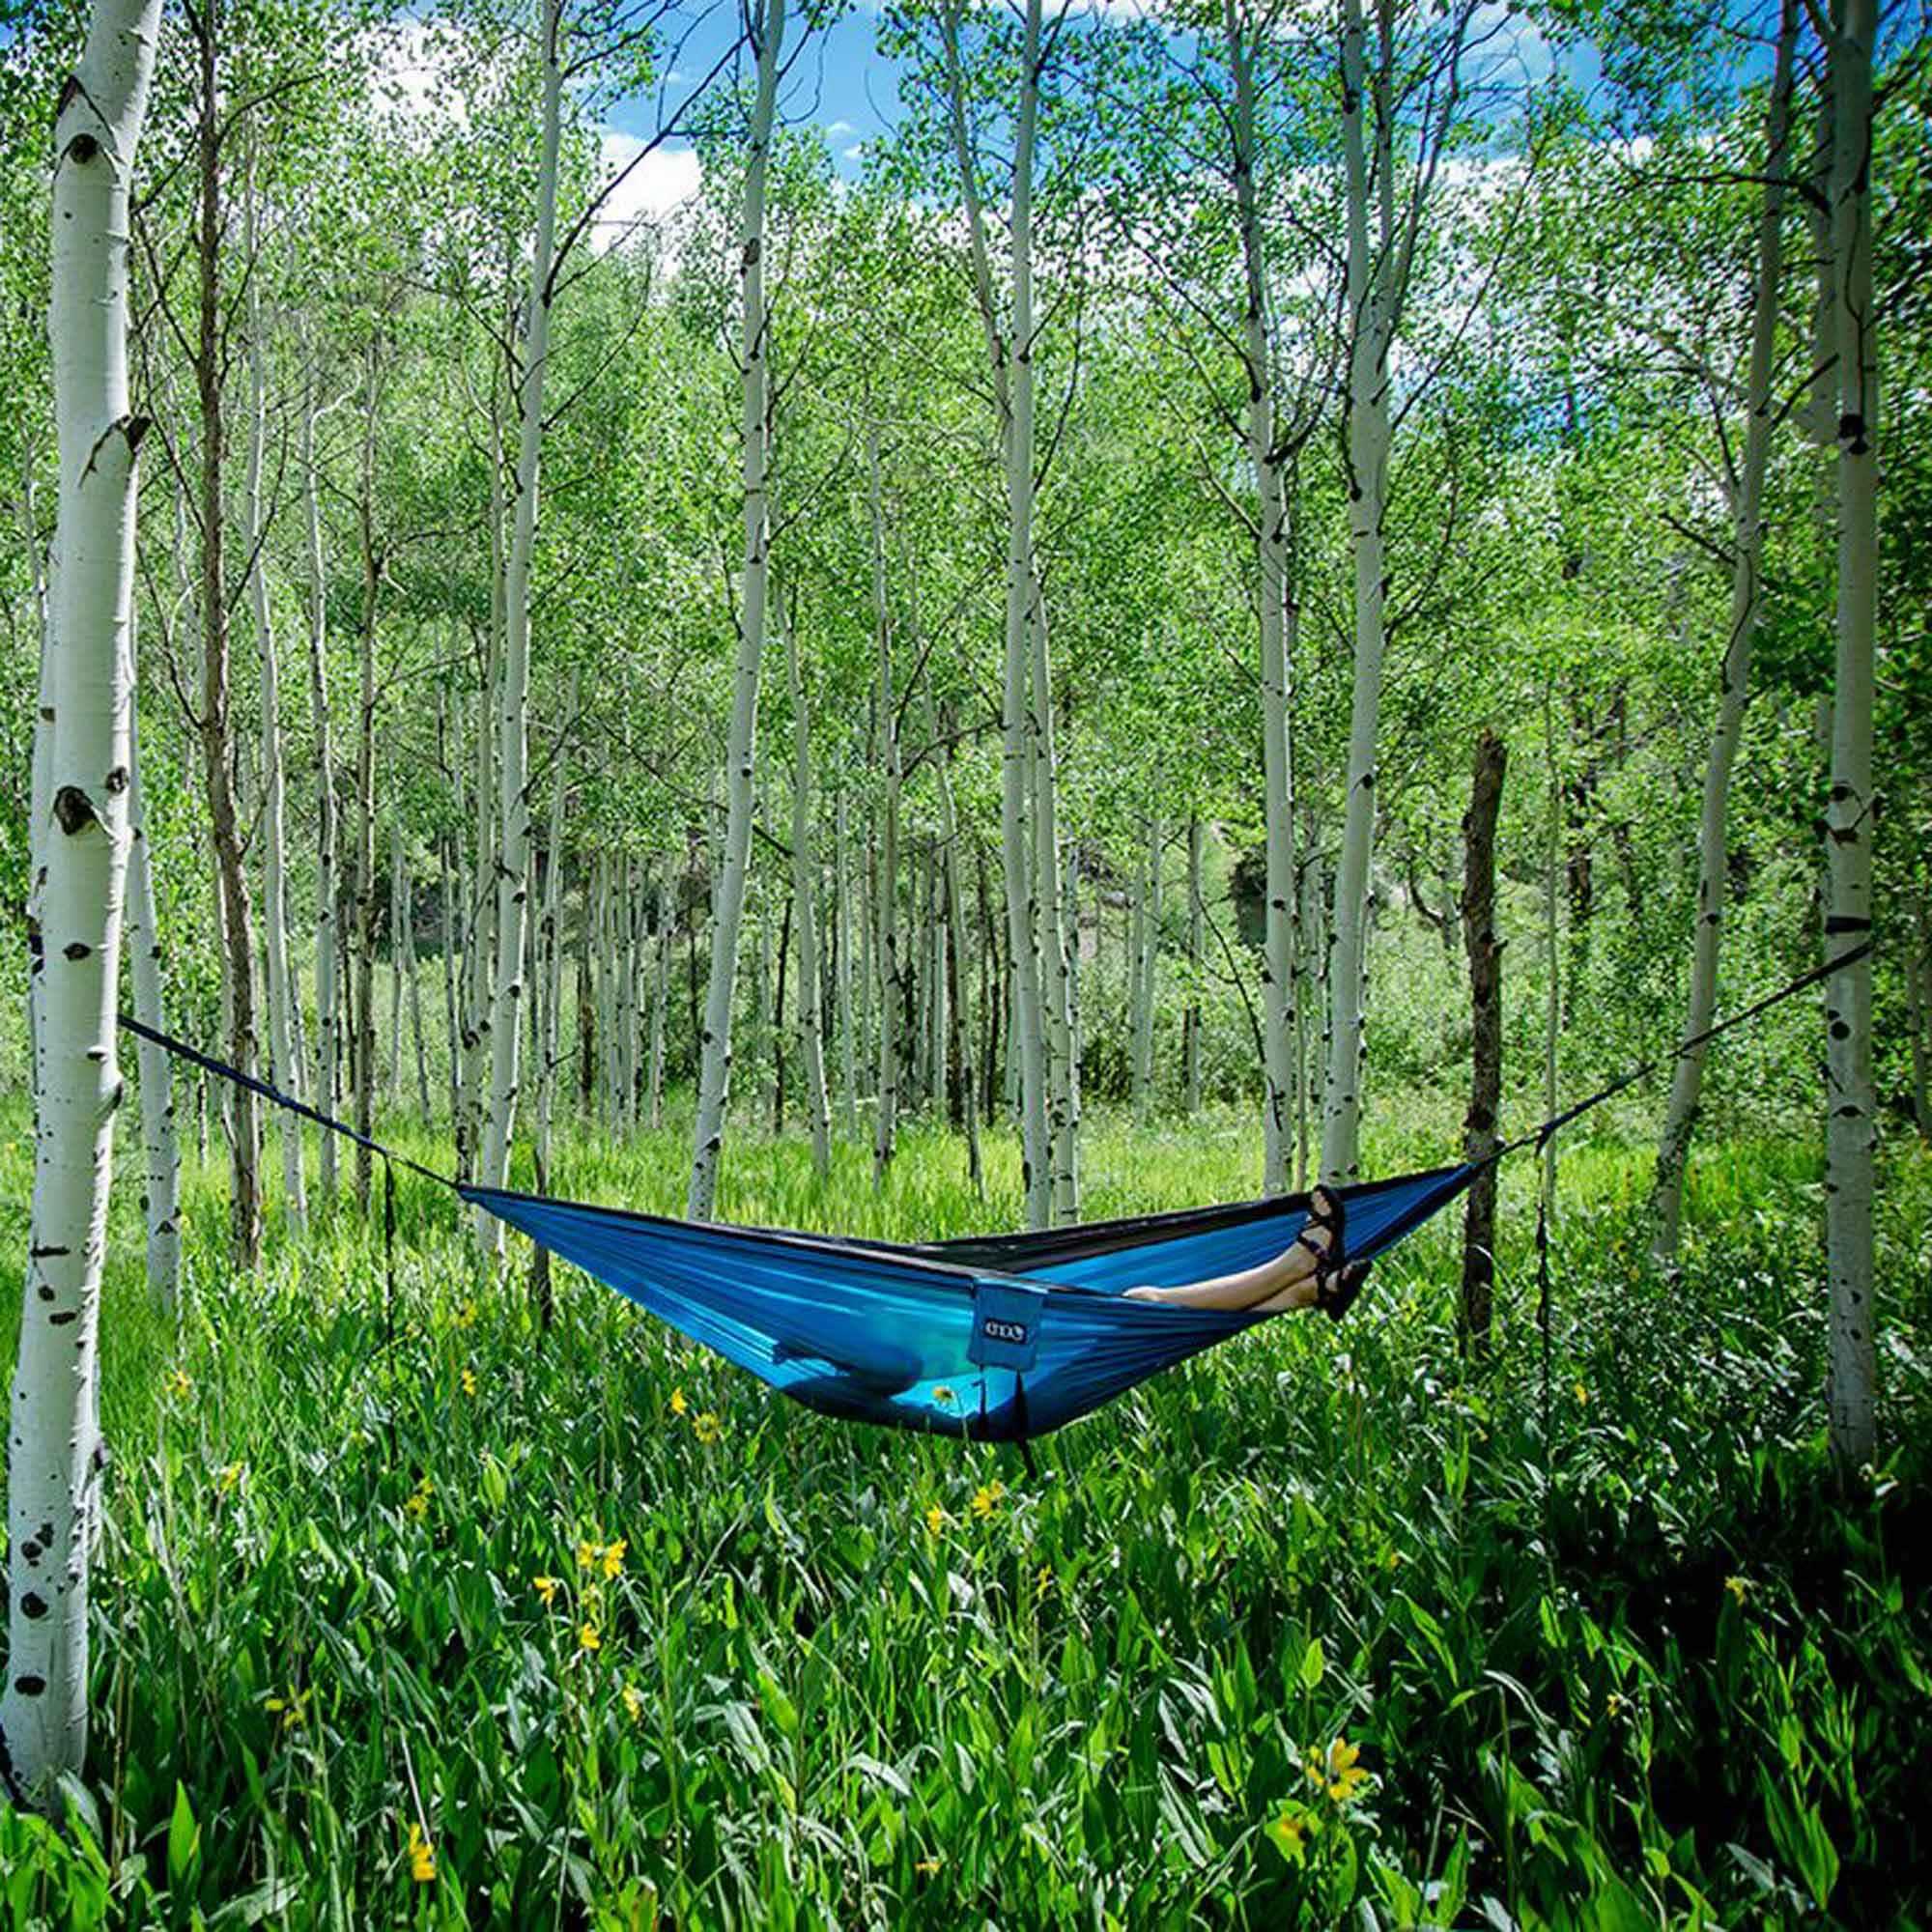 on singlenest eno sale com friday black amazon review hammocks sports academy doublenest hammock etsustore